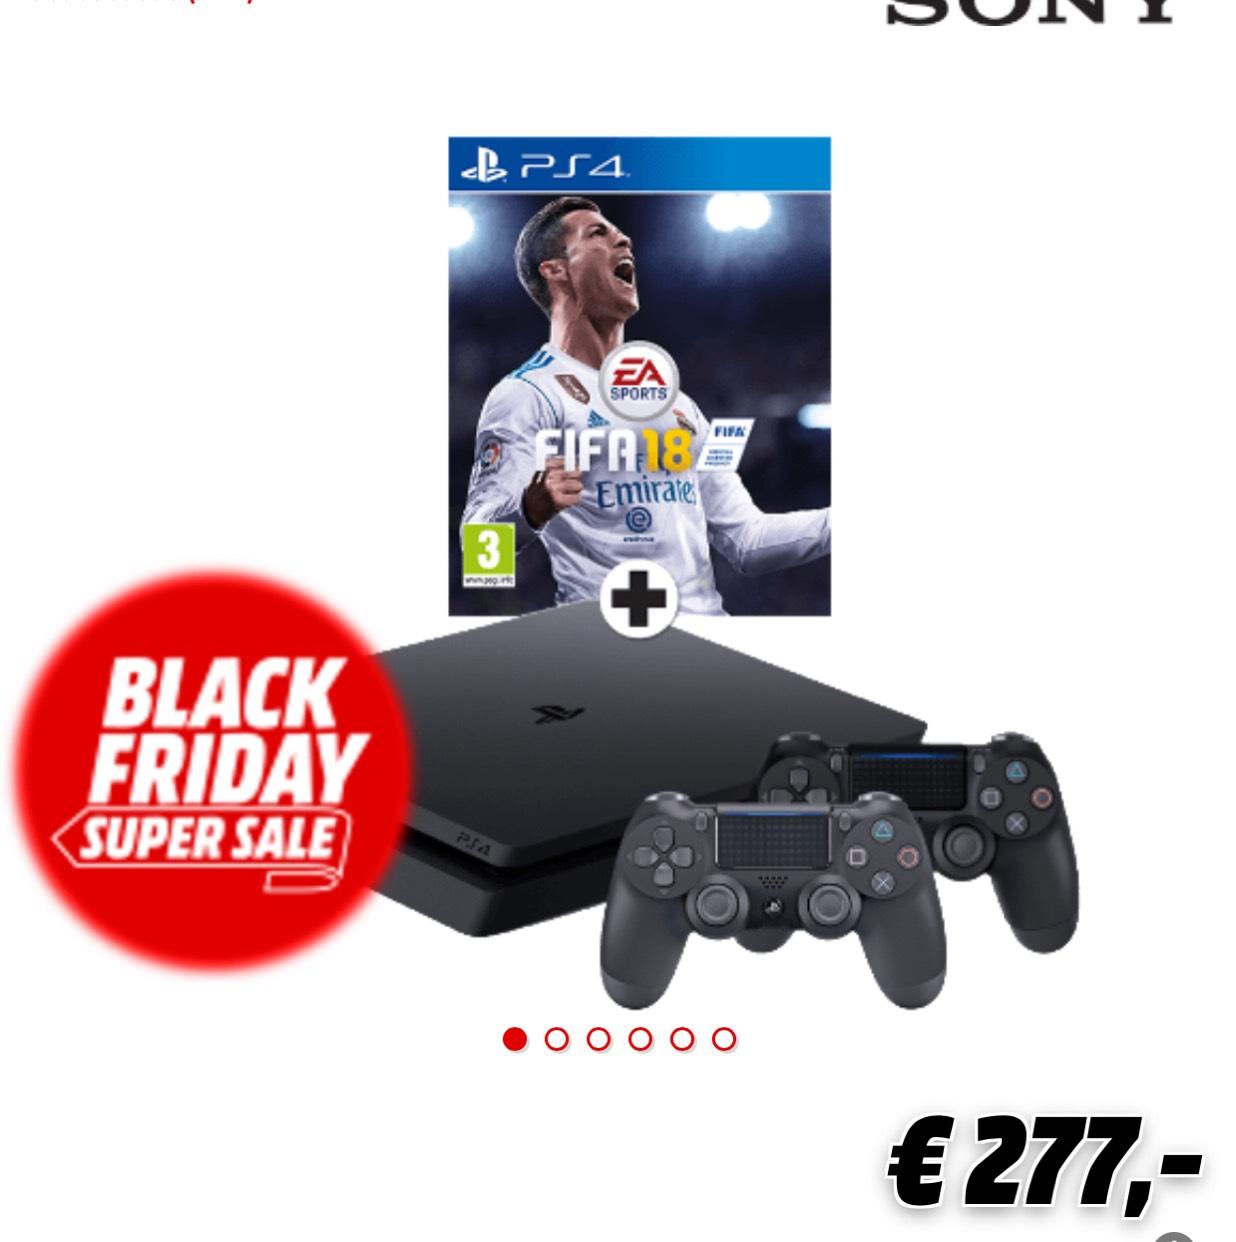 SONY PlayStation 4 (Slim) 1 TB + extra controller + FIFA 18